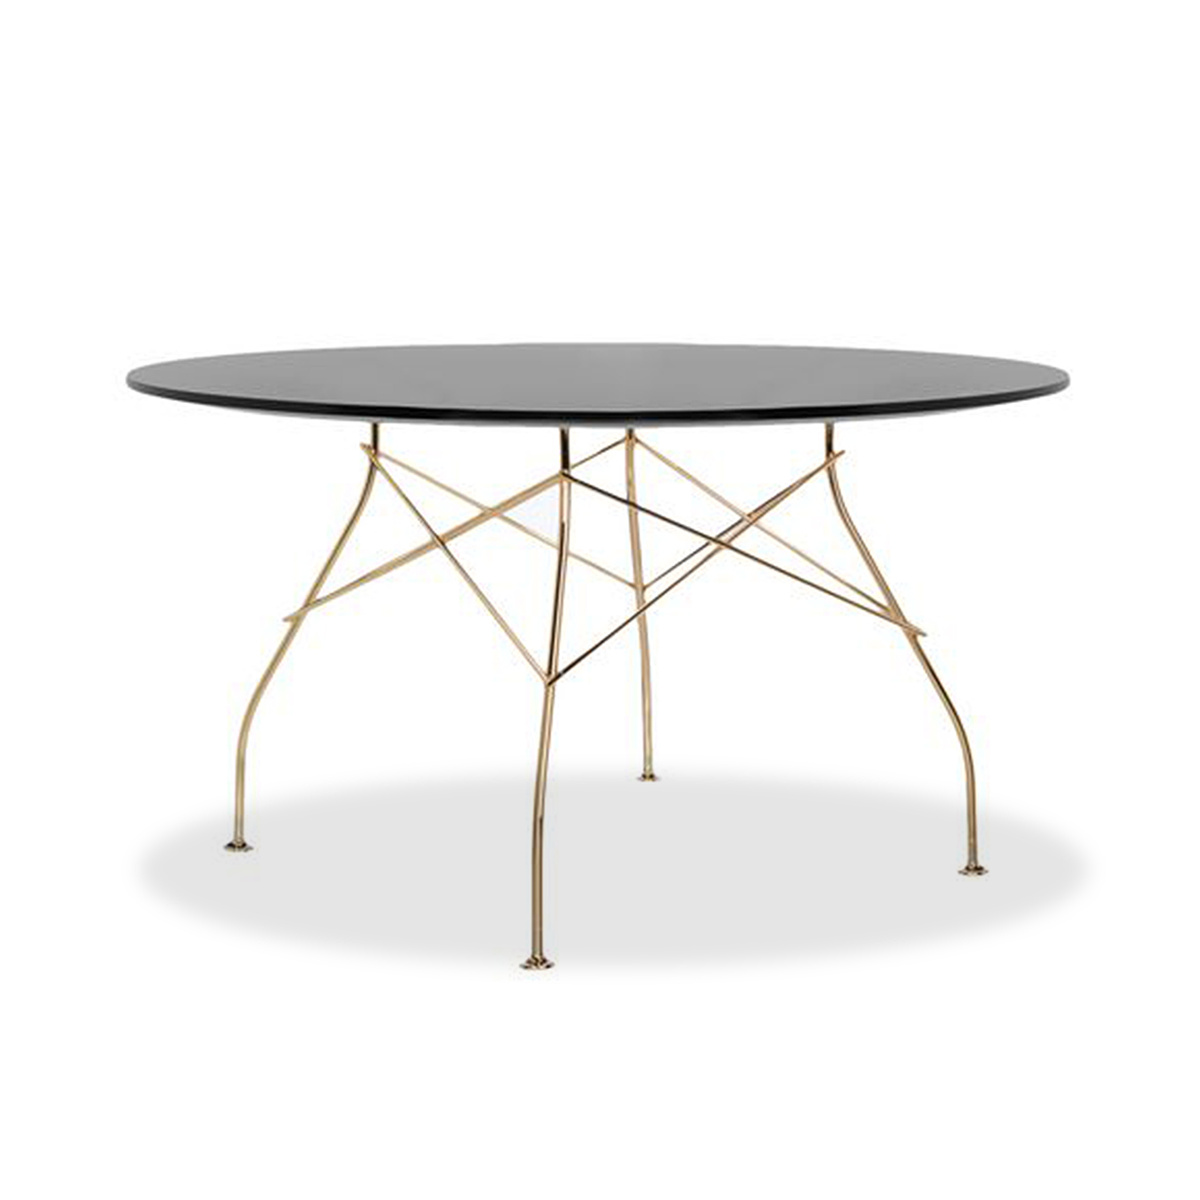 Kartell Tavoli Da Pranzo.Tavolo Rotondo Glossy By Kartell Lovethesign